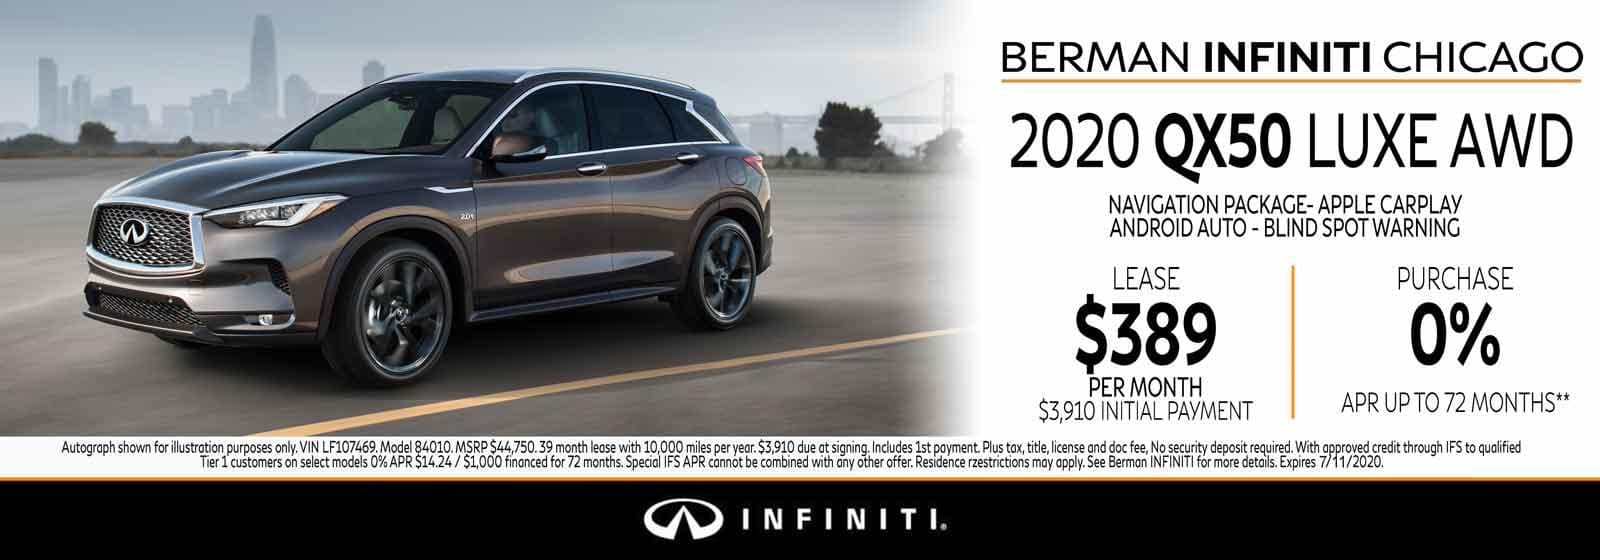 New 2020 INFINITI QX50 July offer at Berman INFINITI Chicago!